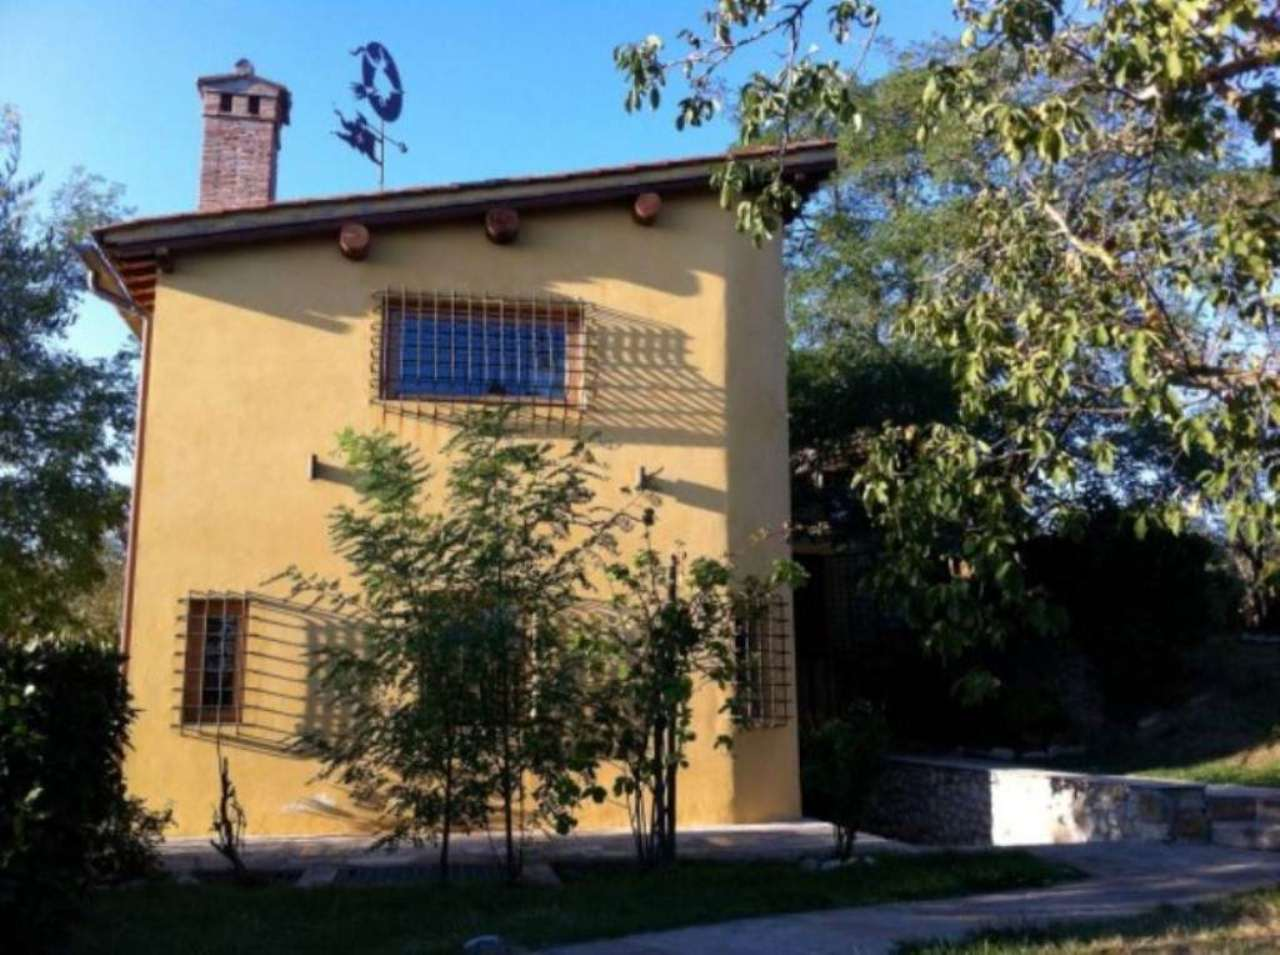 Appartamento firenze vendita zona 12 duomo for Bagno a ripoli firenze bus